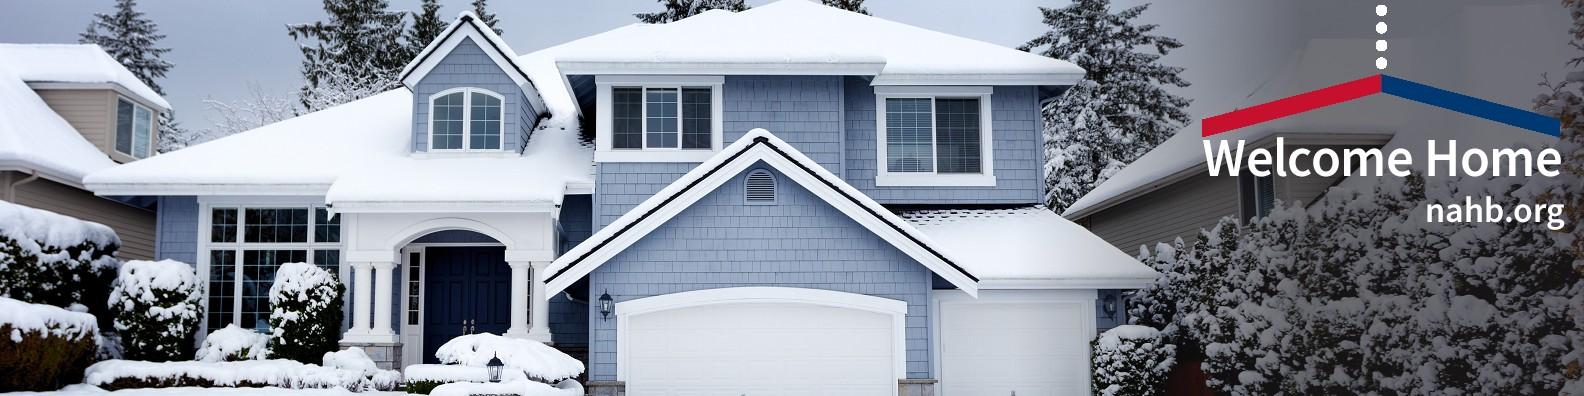 National Ociation Of Home Builders